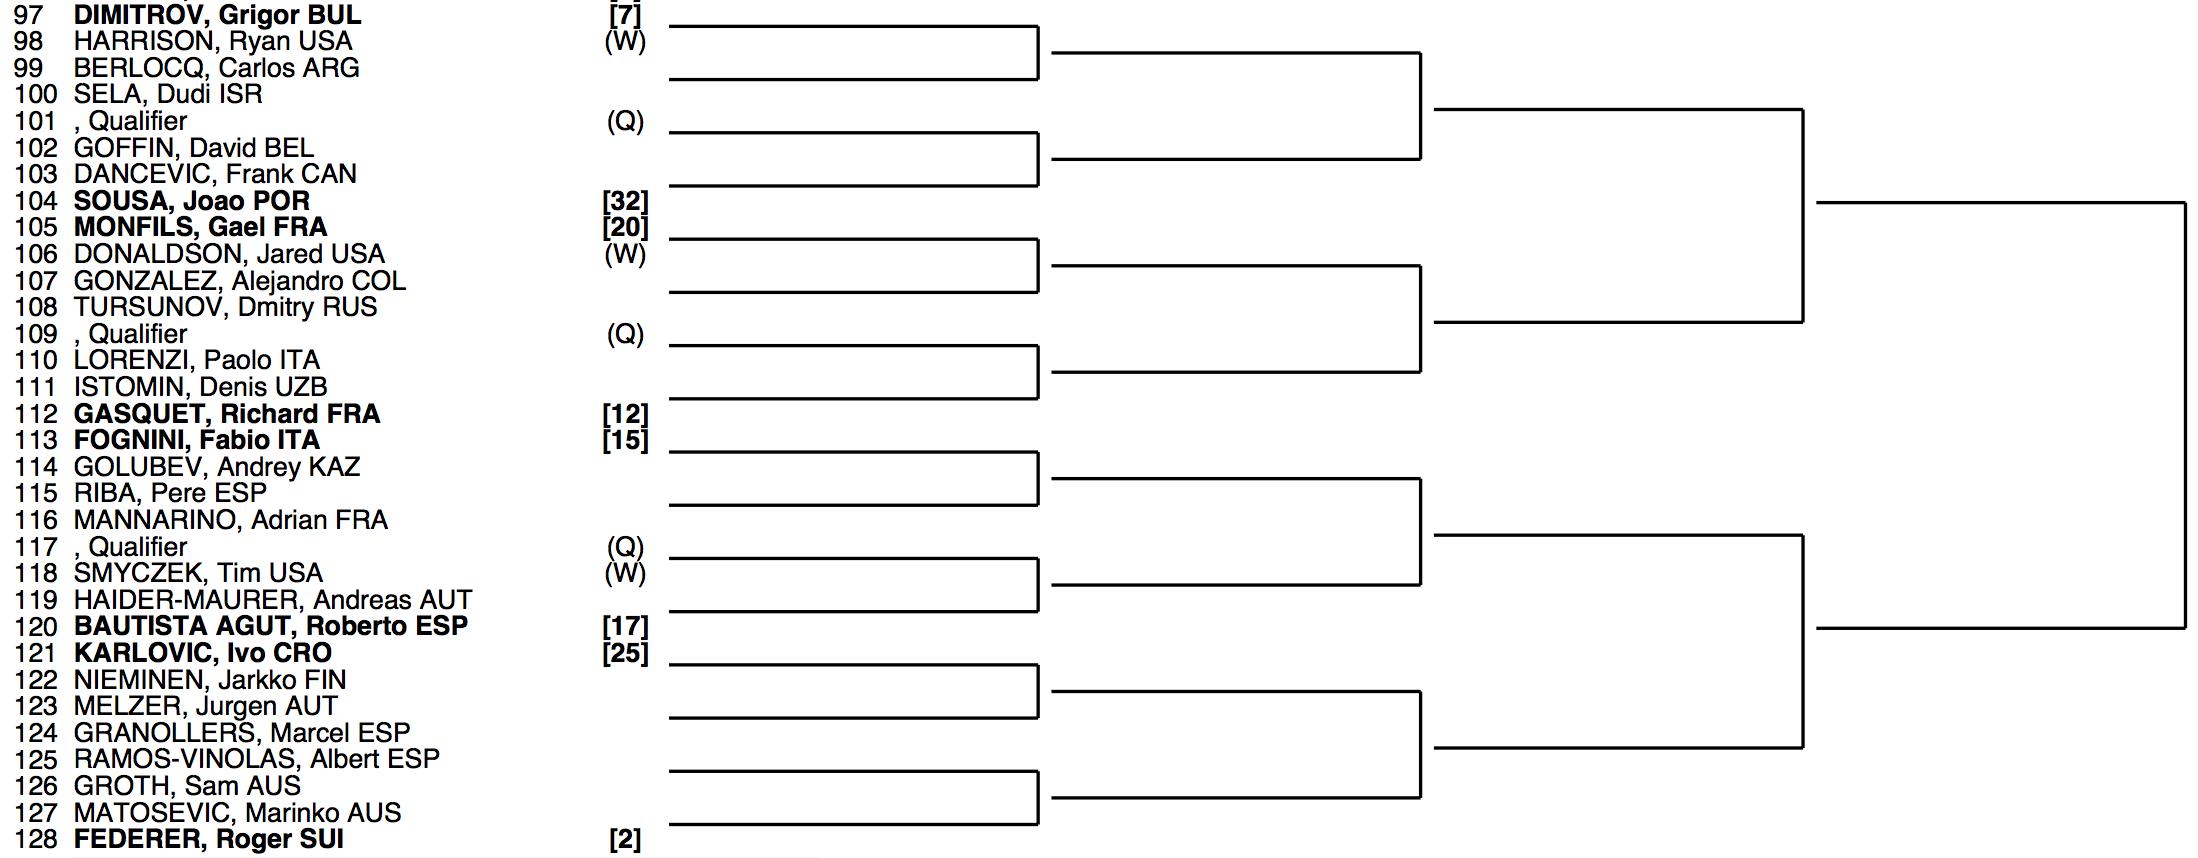 US Open 2014 draw 4:4